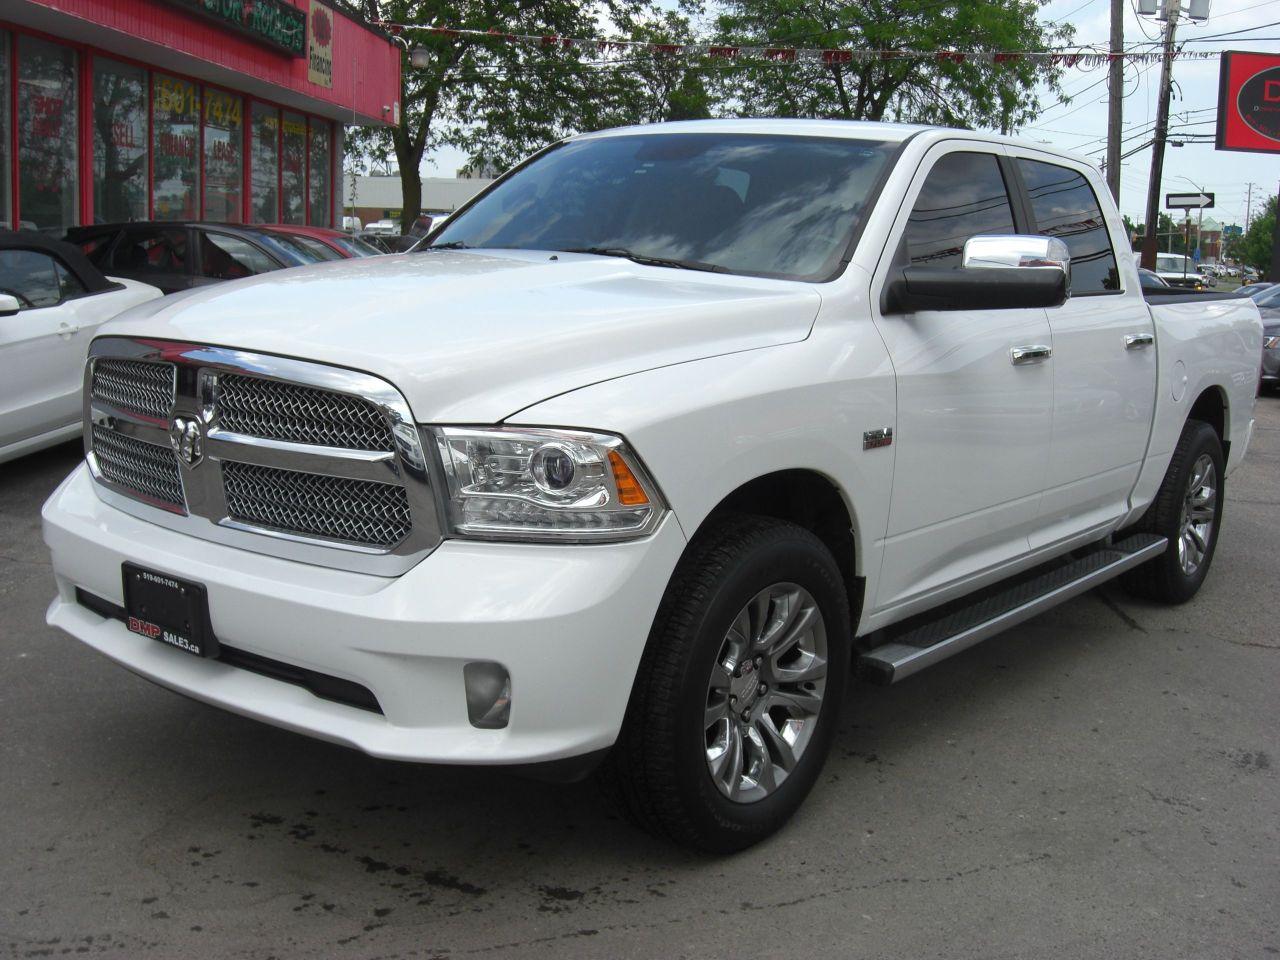 2014 Ram 1500 Downtown Motor Products Dodge Navigation Radio